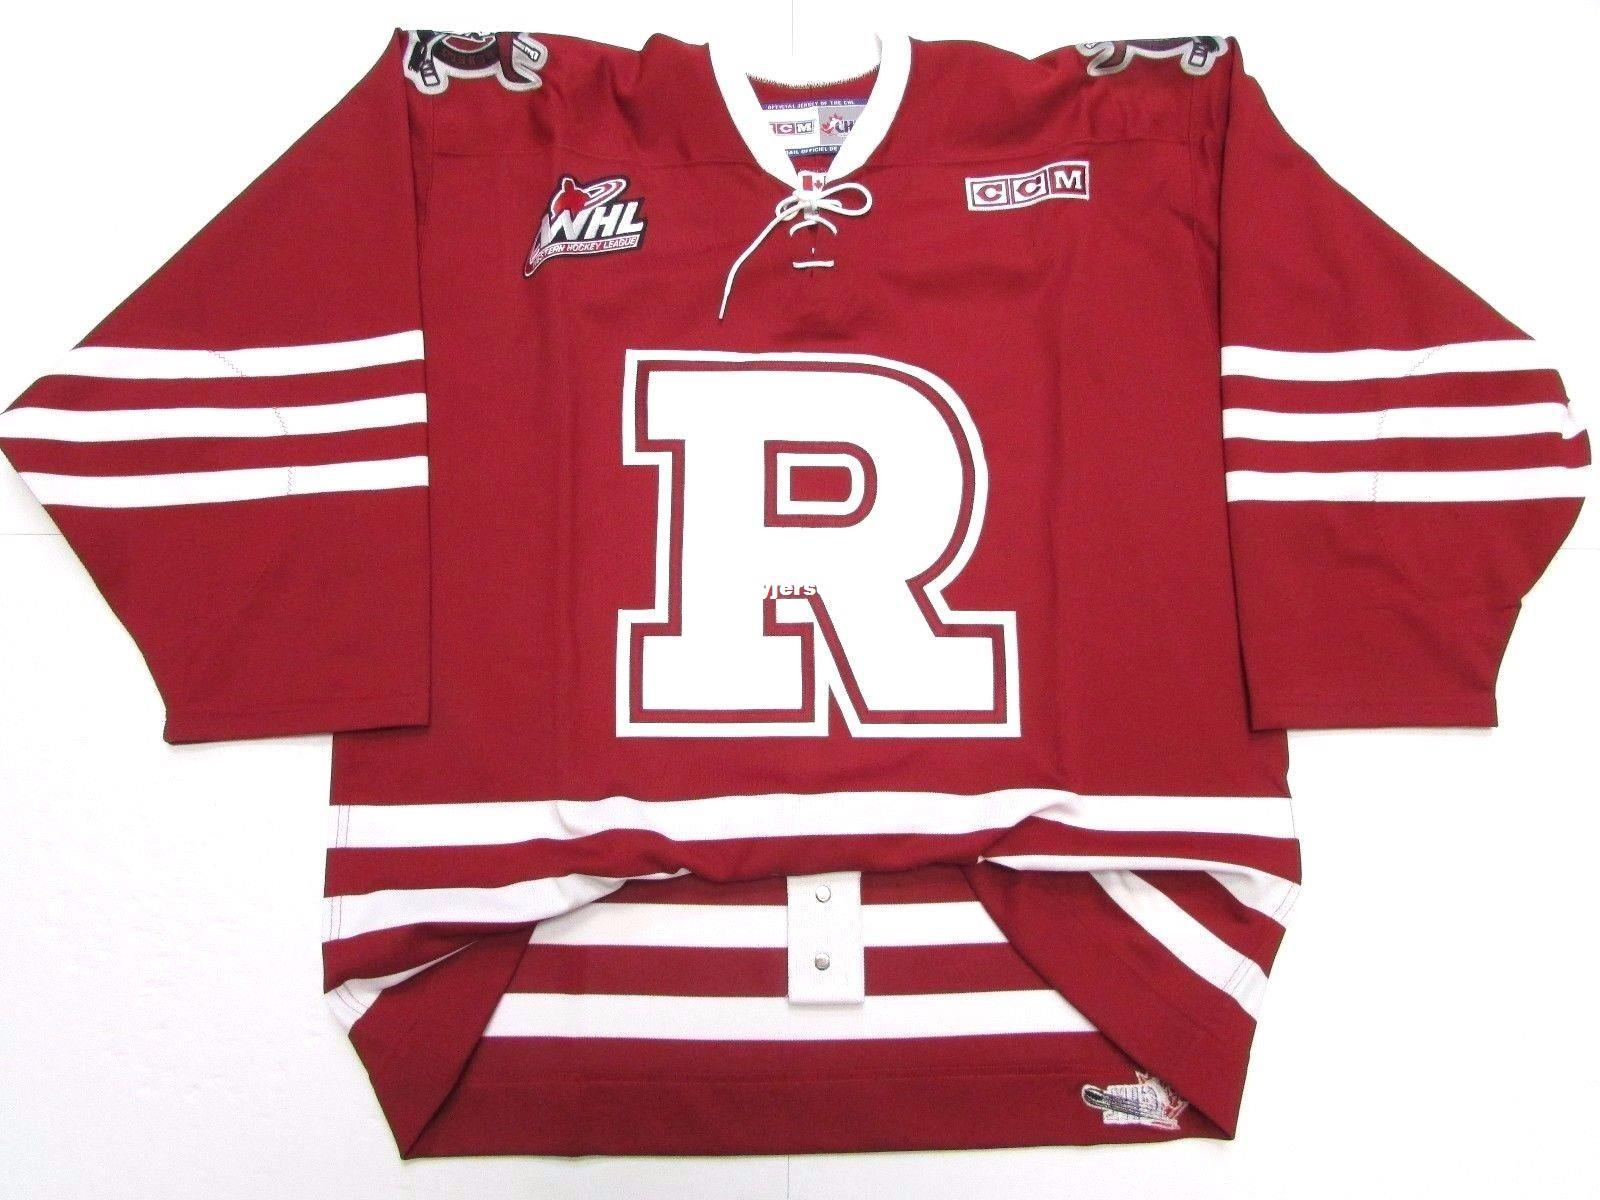 Cheap Red Gray Hockey Jersey Best Authentic Ccm Hockey Jerseys Cheap 279e855e5